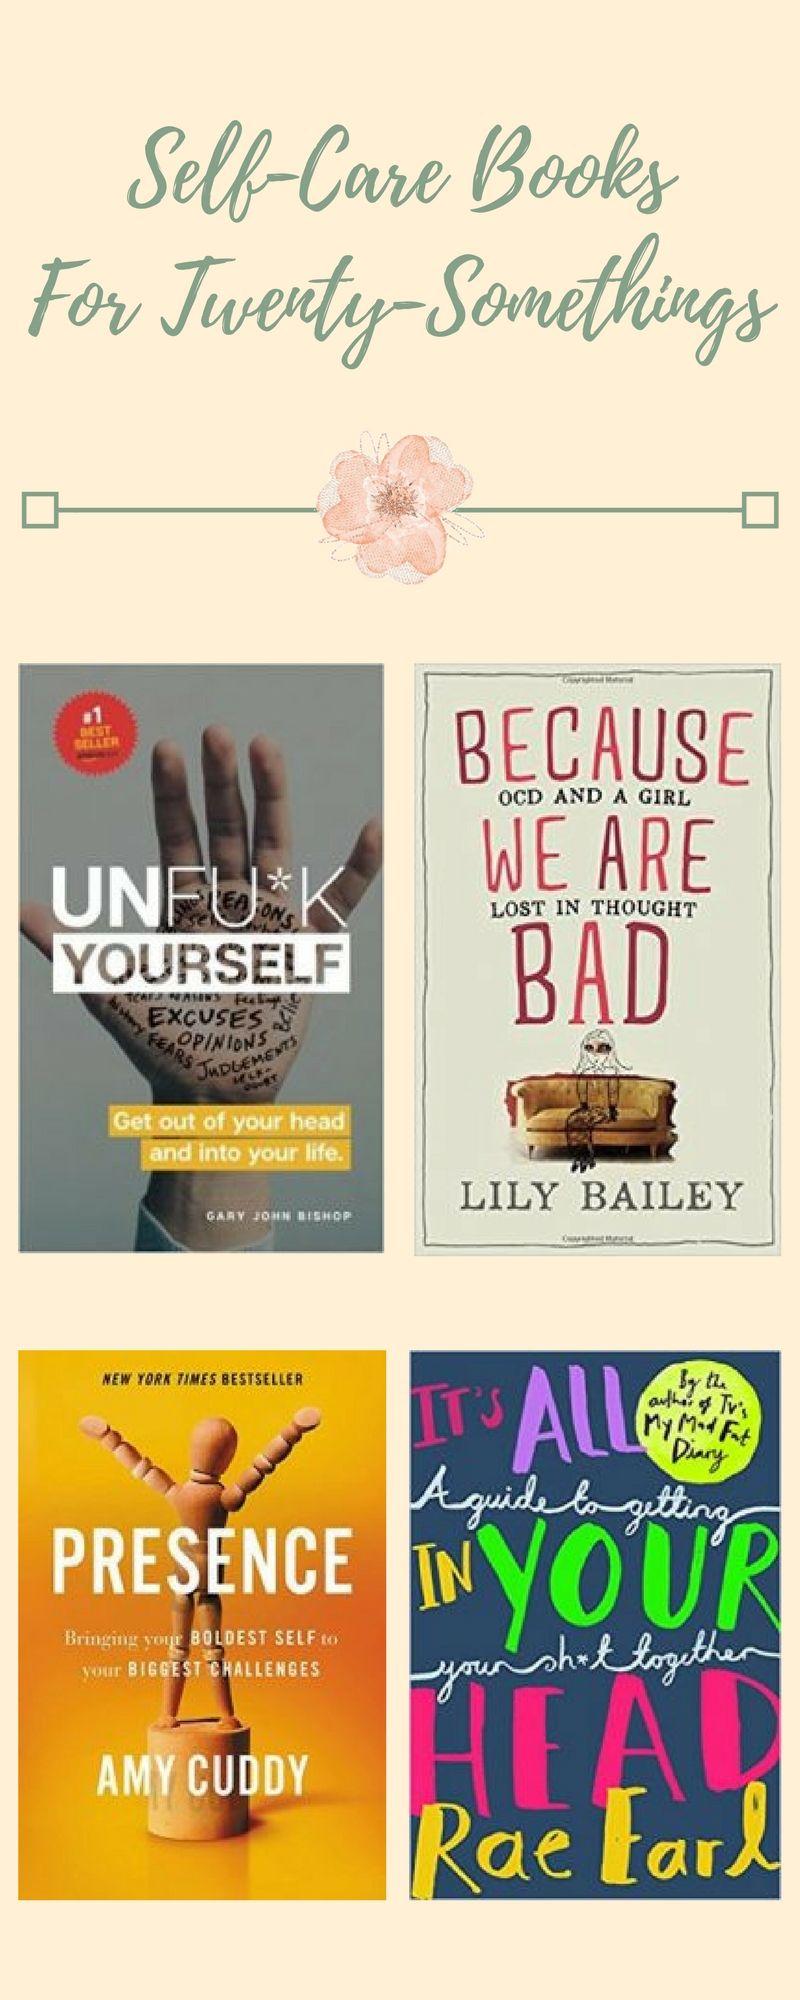 SelfCare Books for TwentySomethings How to better